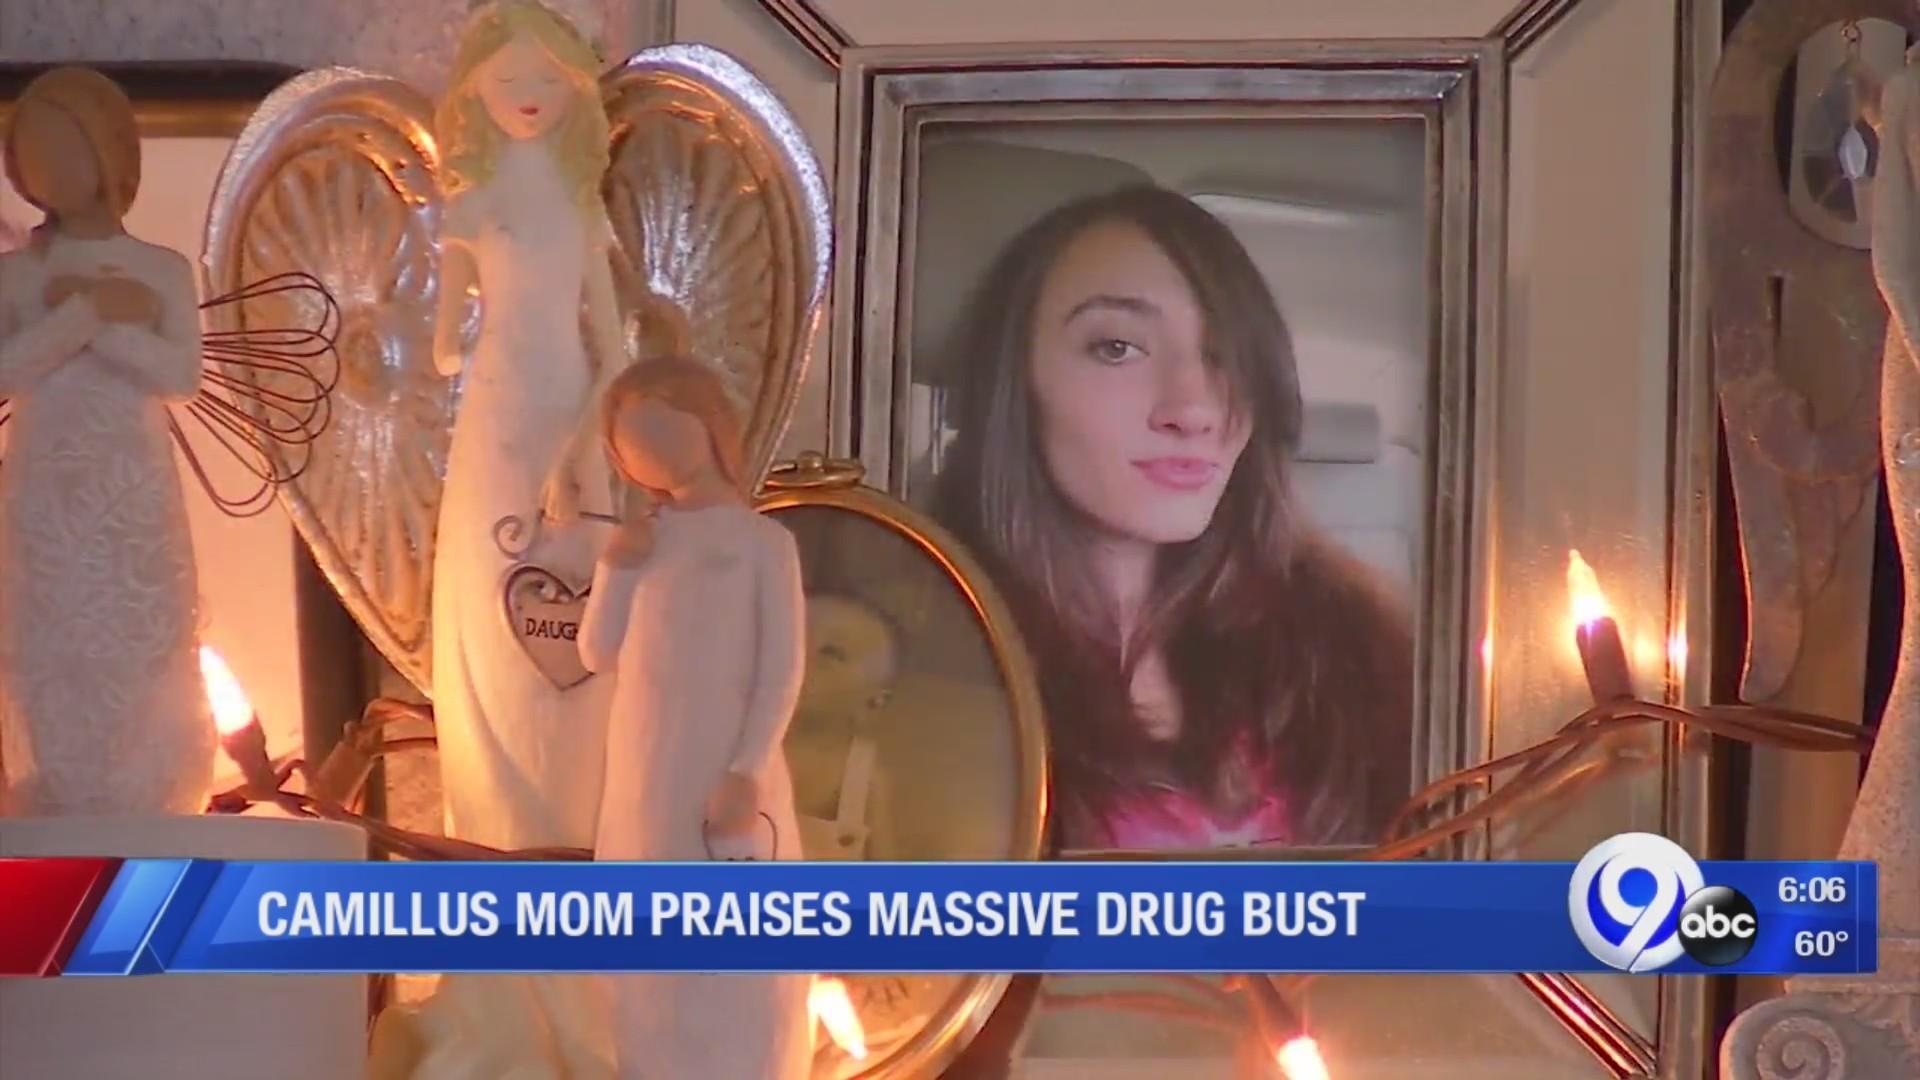 Camillus_mom_praises_massive_drug_bust_0_20190508222947